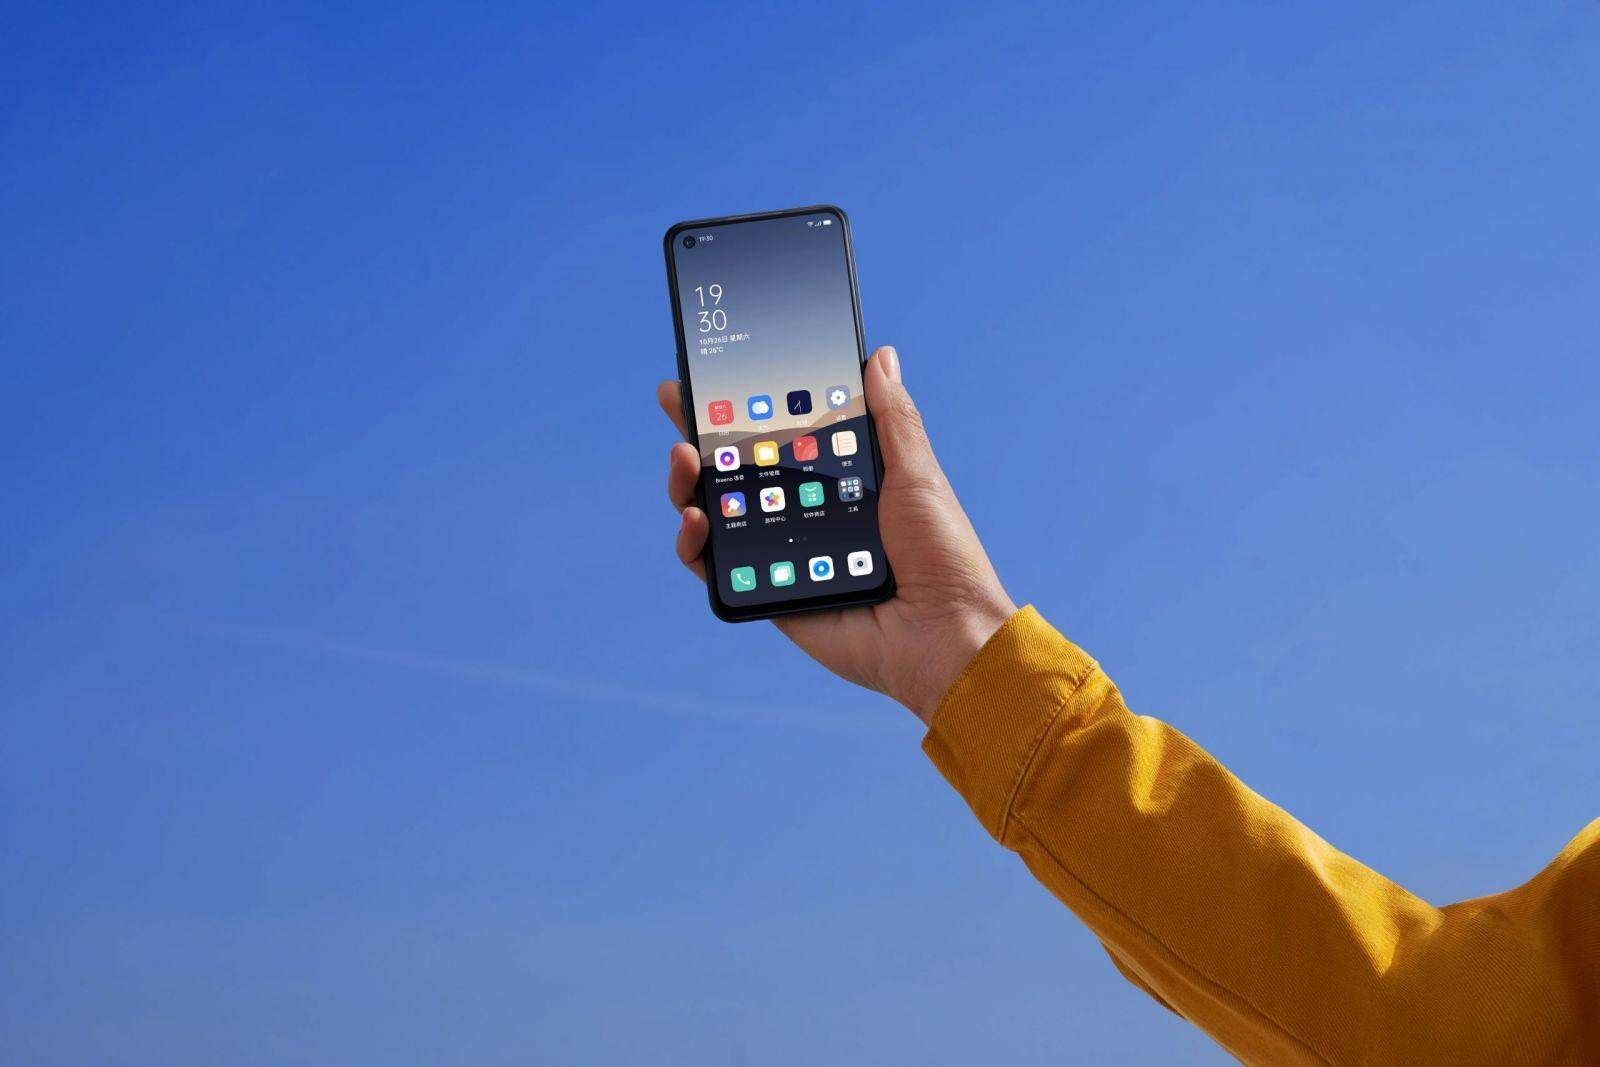 OPPO выпустила недорогой смартфон OPPO A72 с мощным аккумулятором (a72 scenario pictures 2 scaled)